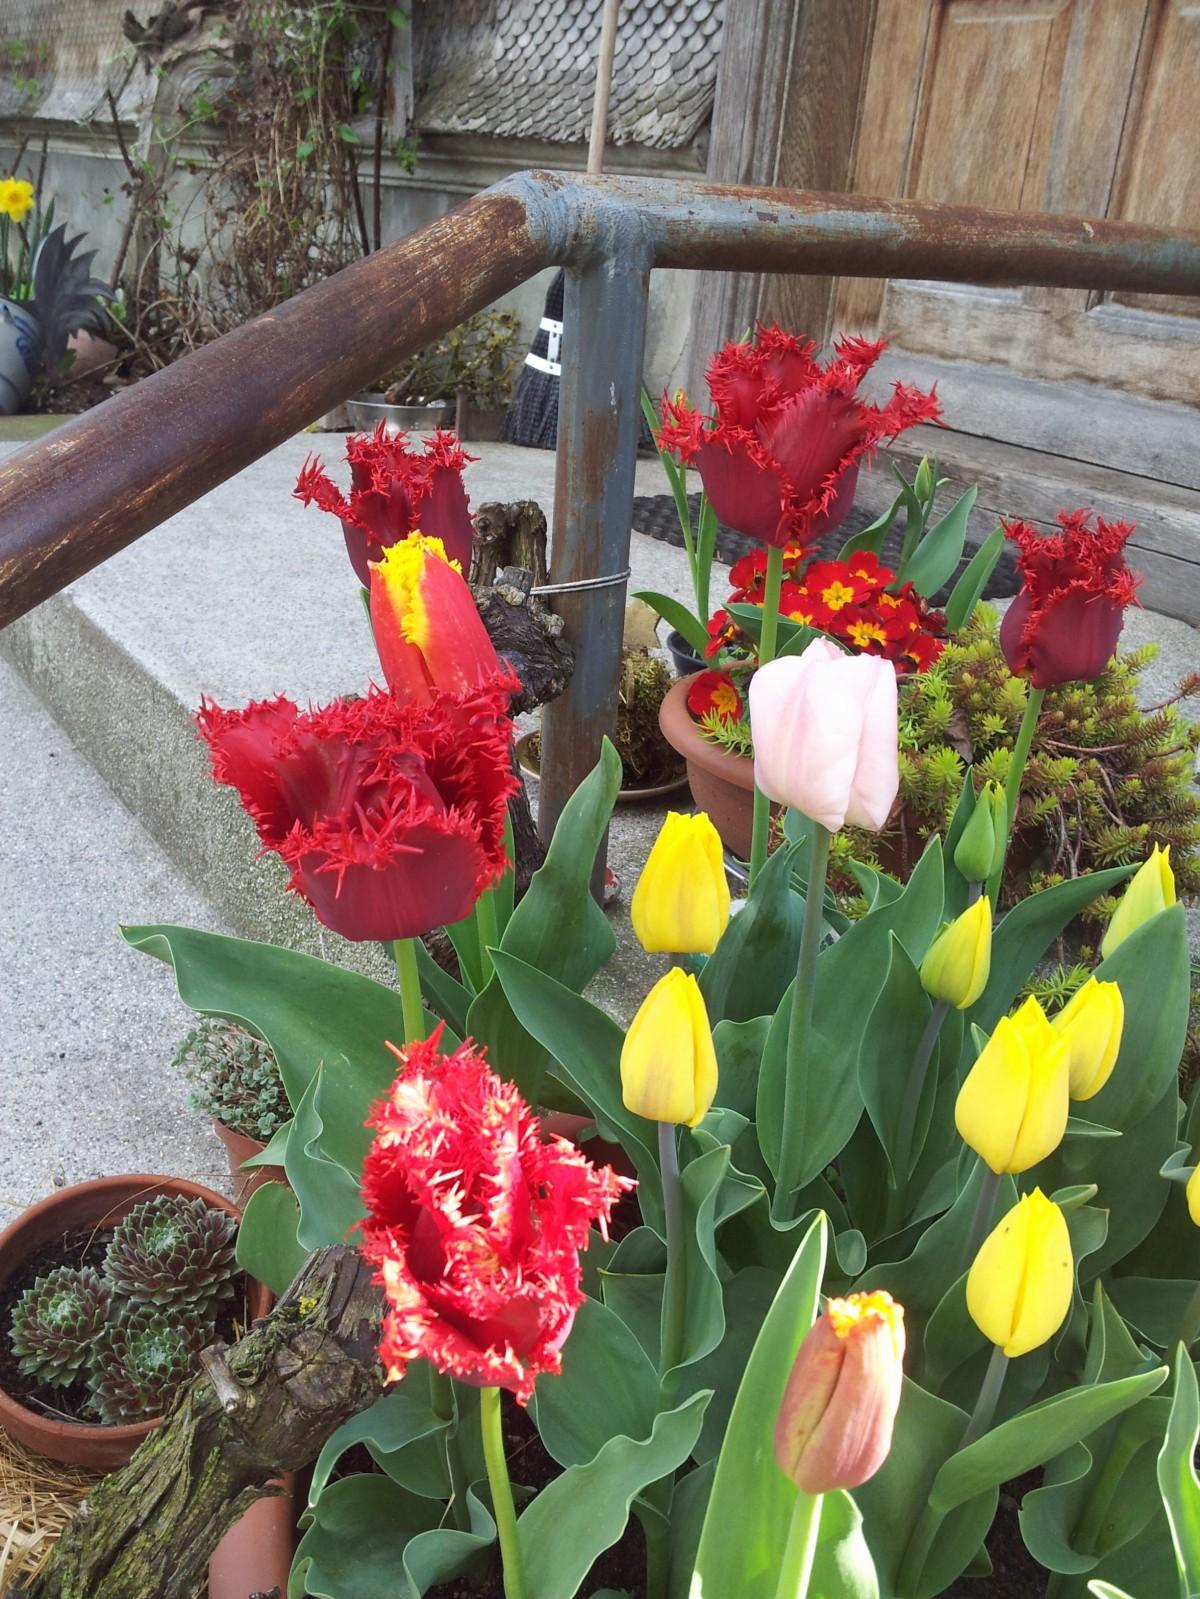 wpid-2015-04-18-16.28.18.jpg.jpeg